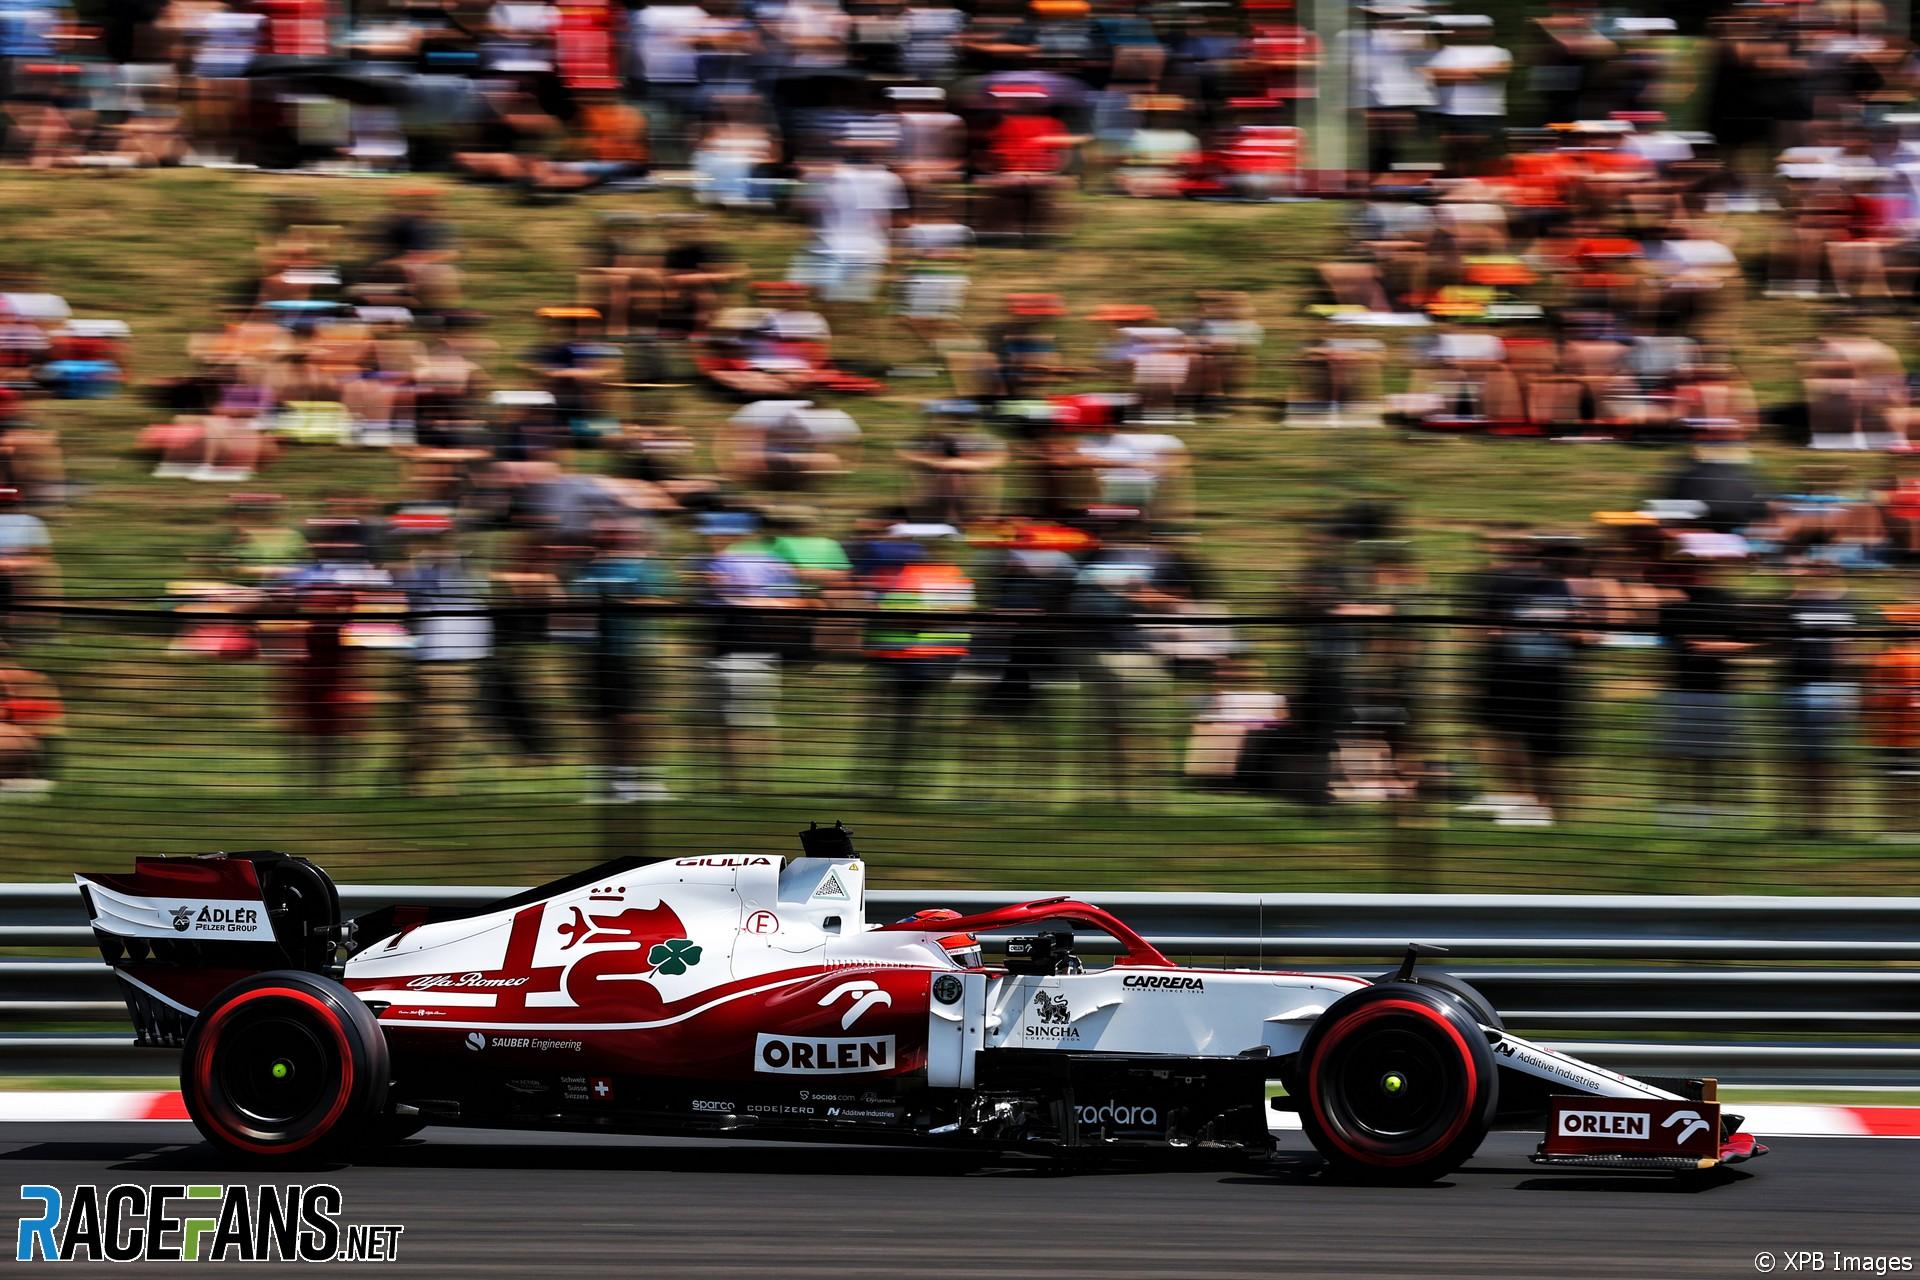 Kimi Raikkonen, Alfa Romeo, Hungaroring, 2021